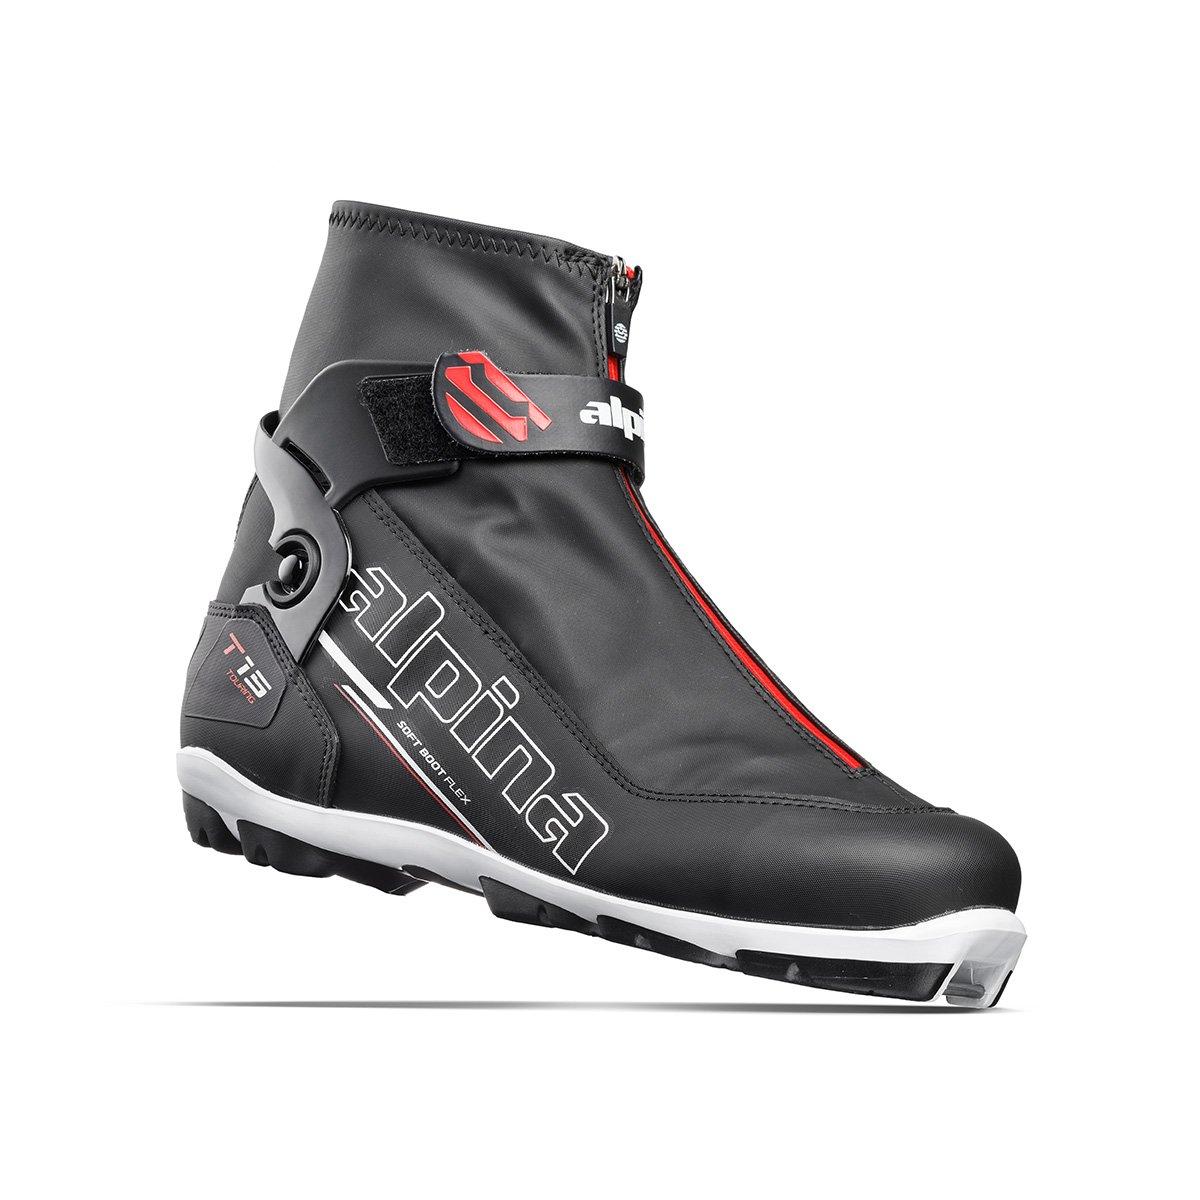 Alpina T15 Nordic Ski Boots